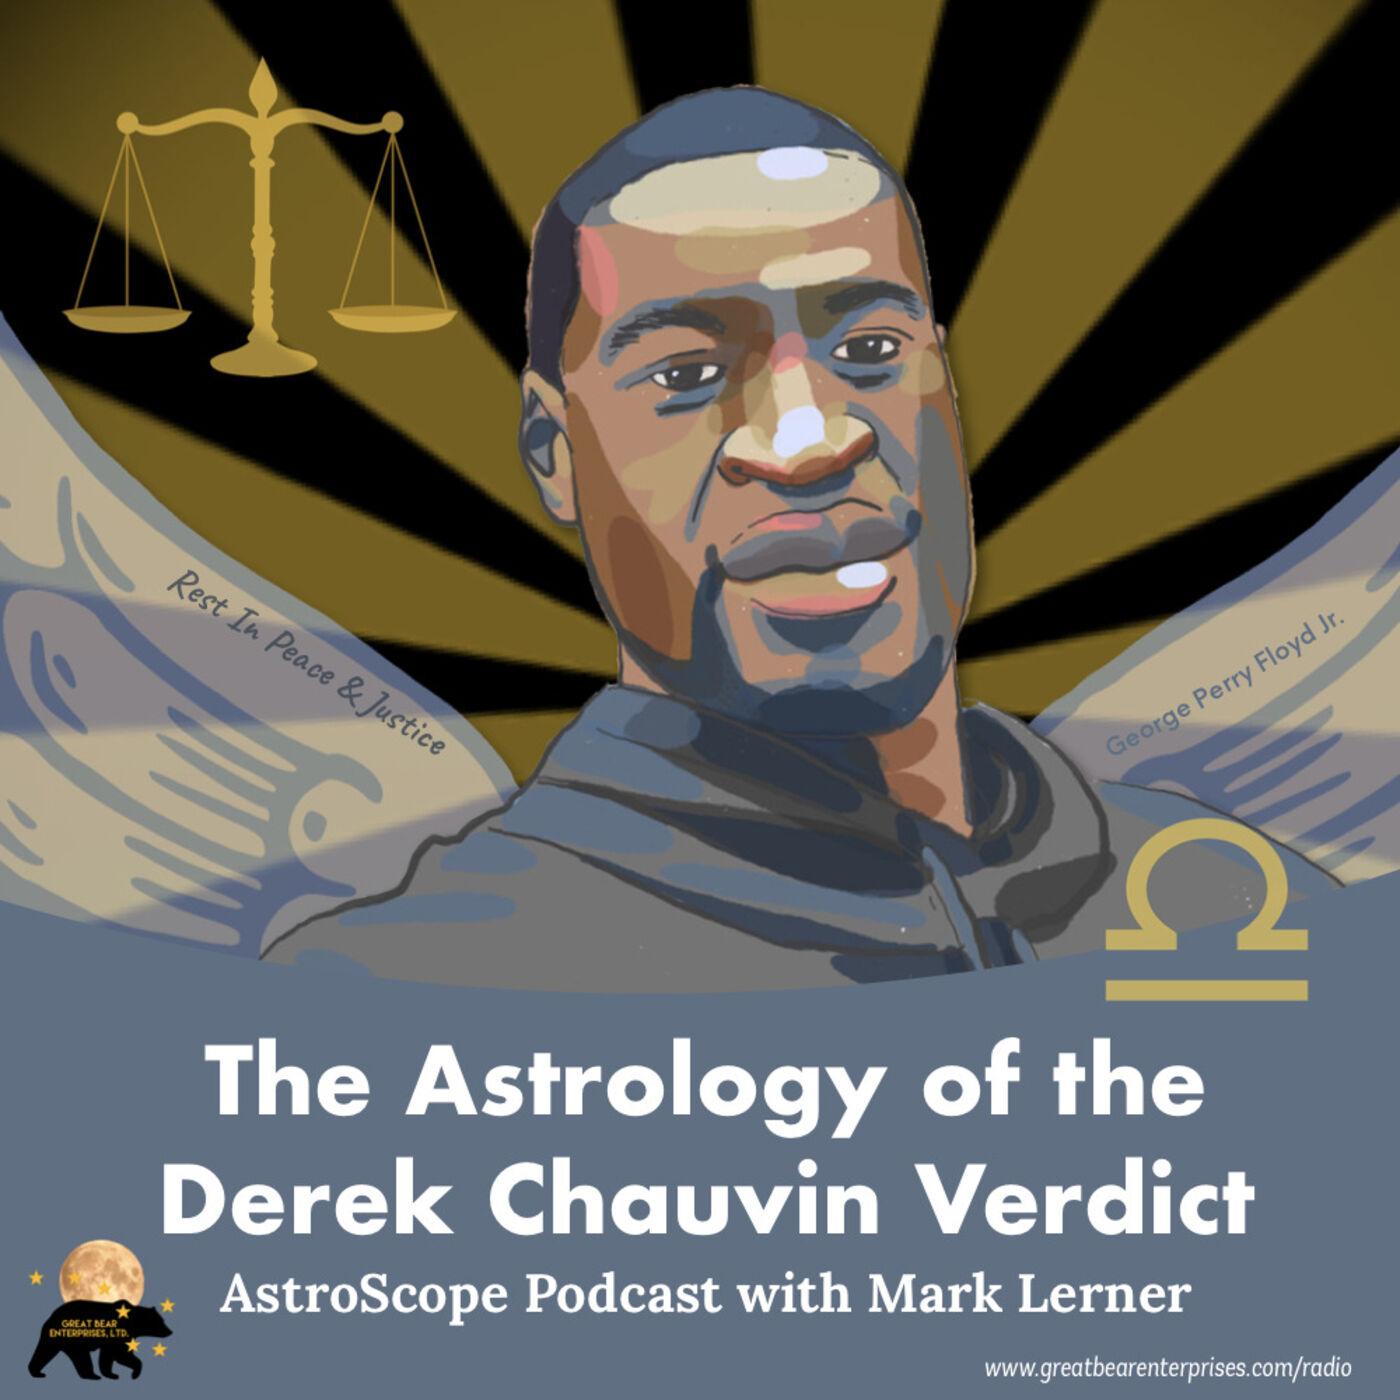 The Astrology of the Derek Chauvin Verdict